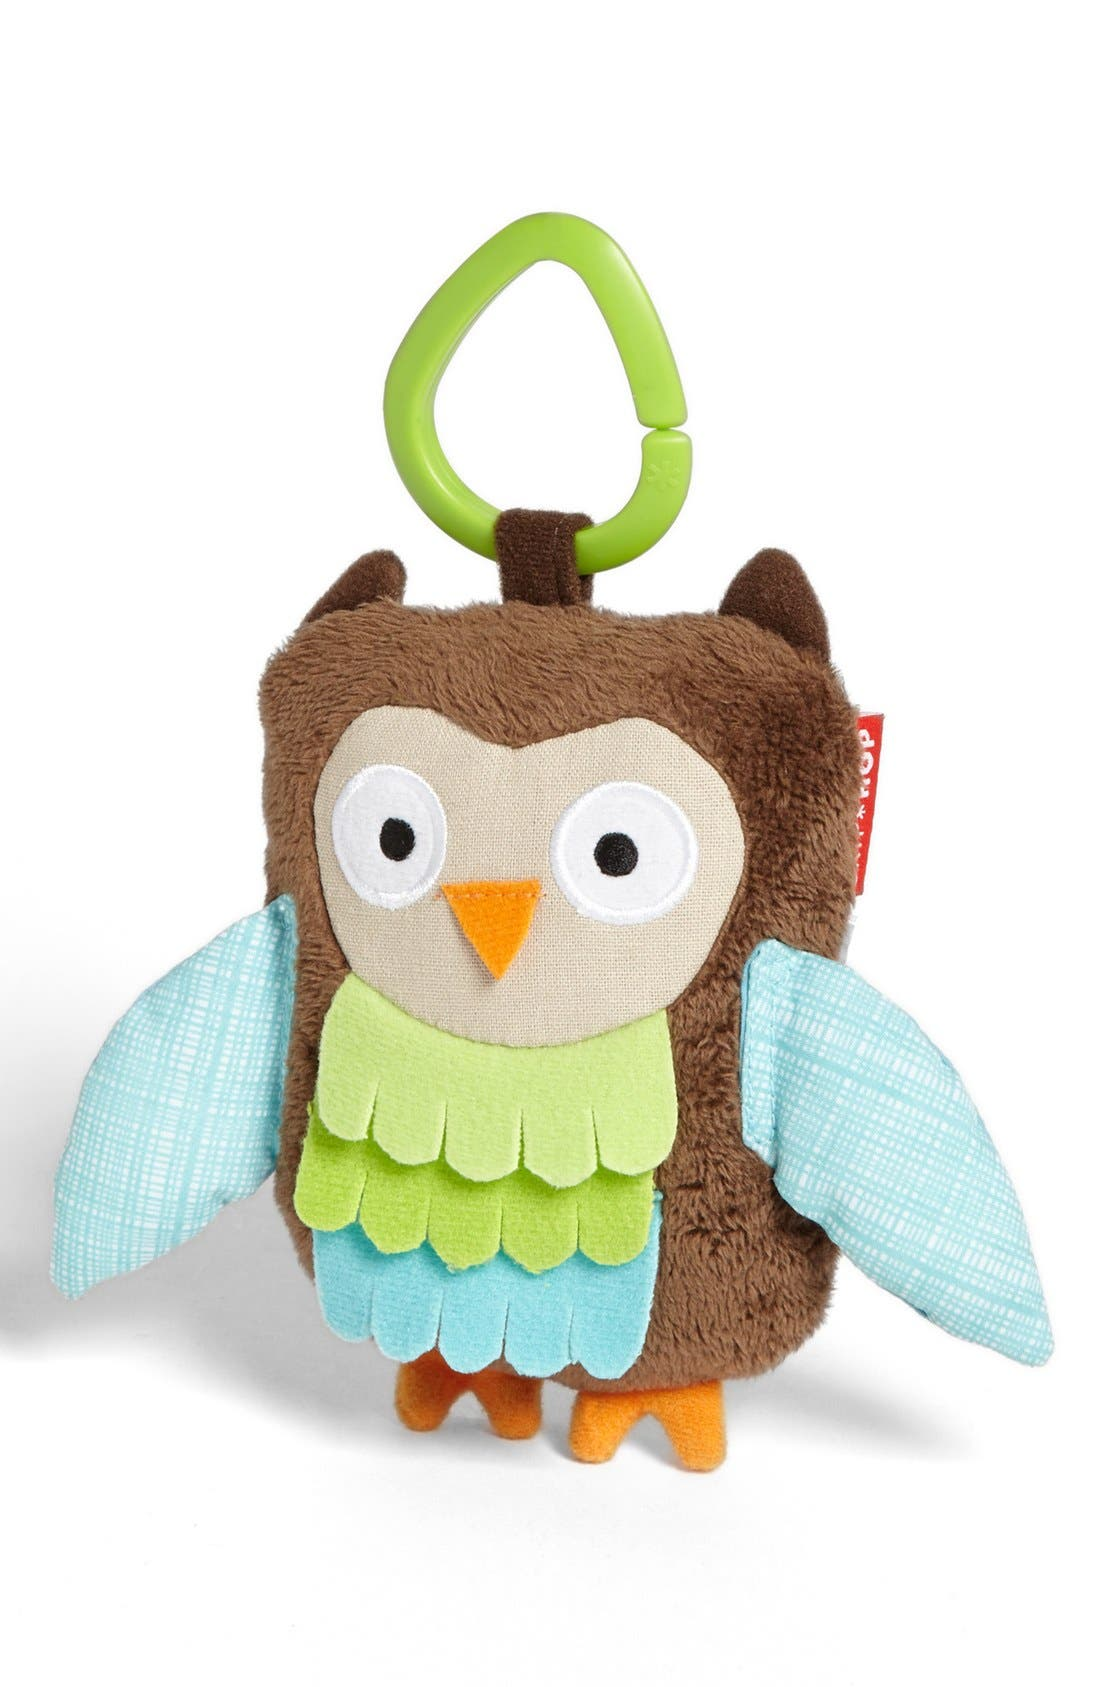 Alternate Image 1 Selected - Skip Hop 'Wise Owl' Stroller Toy